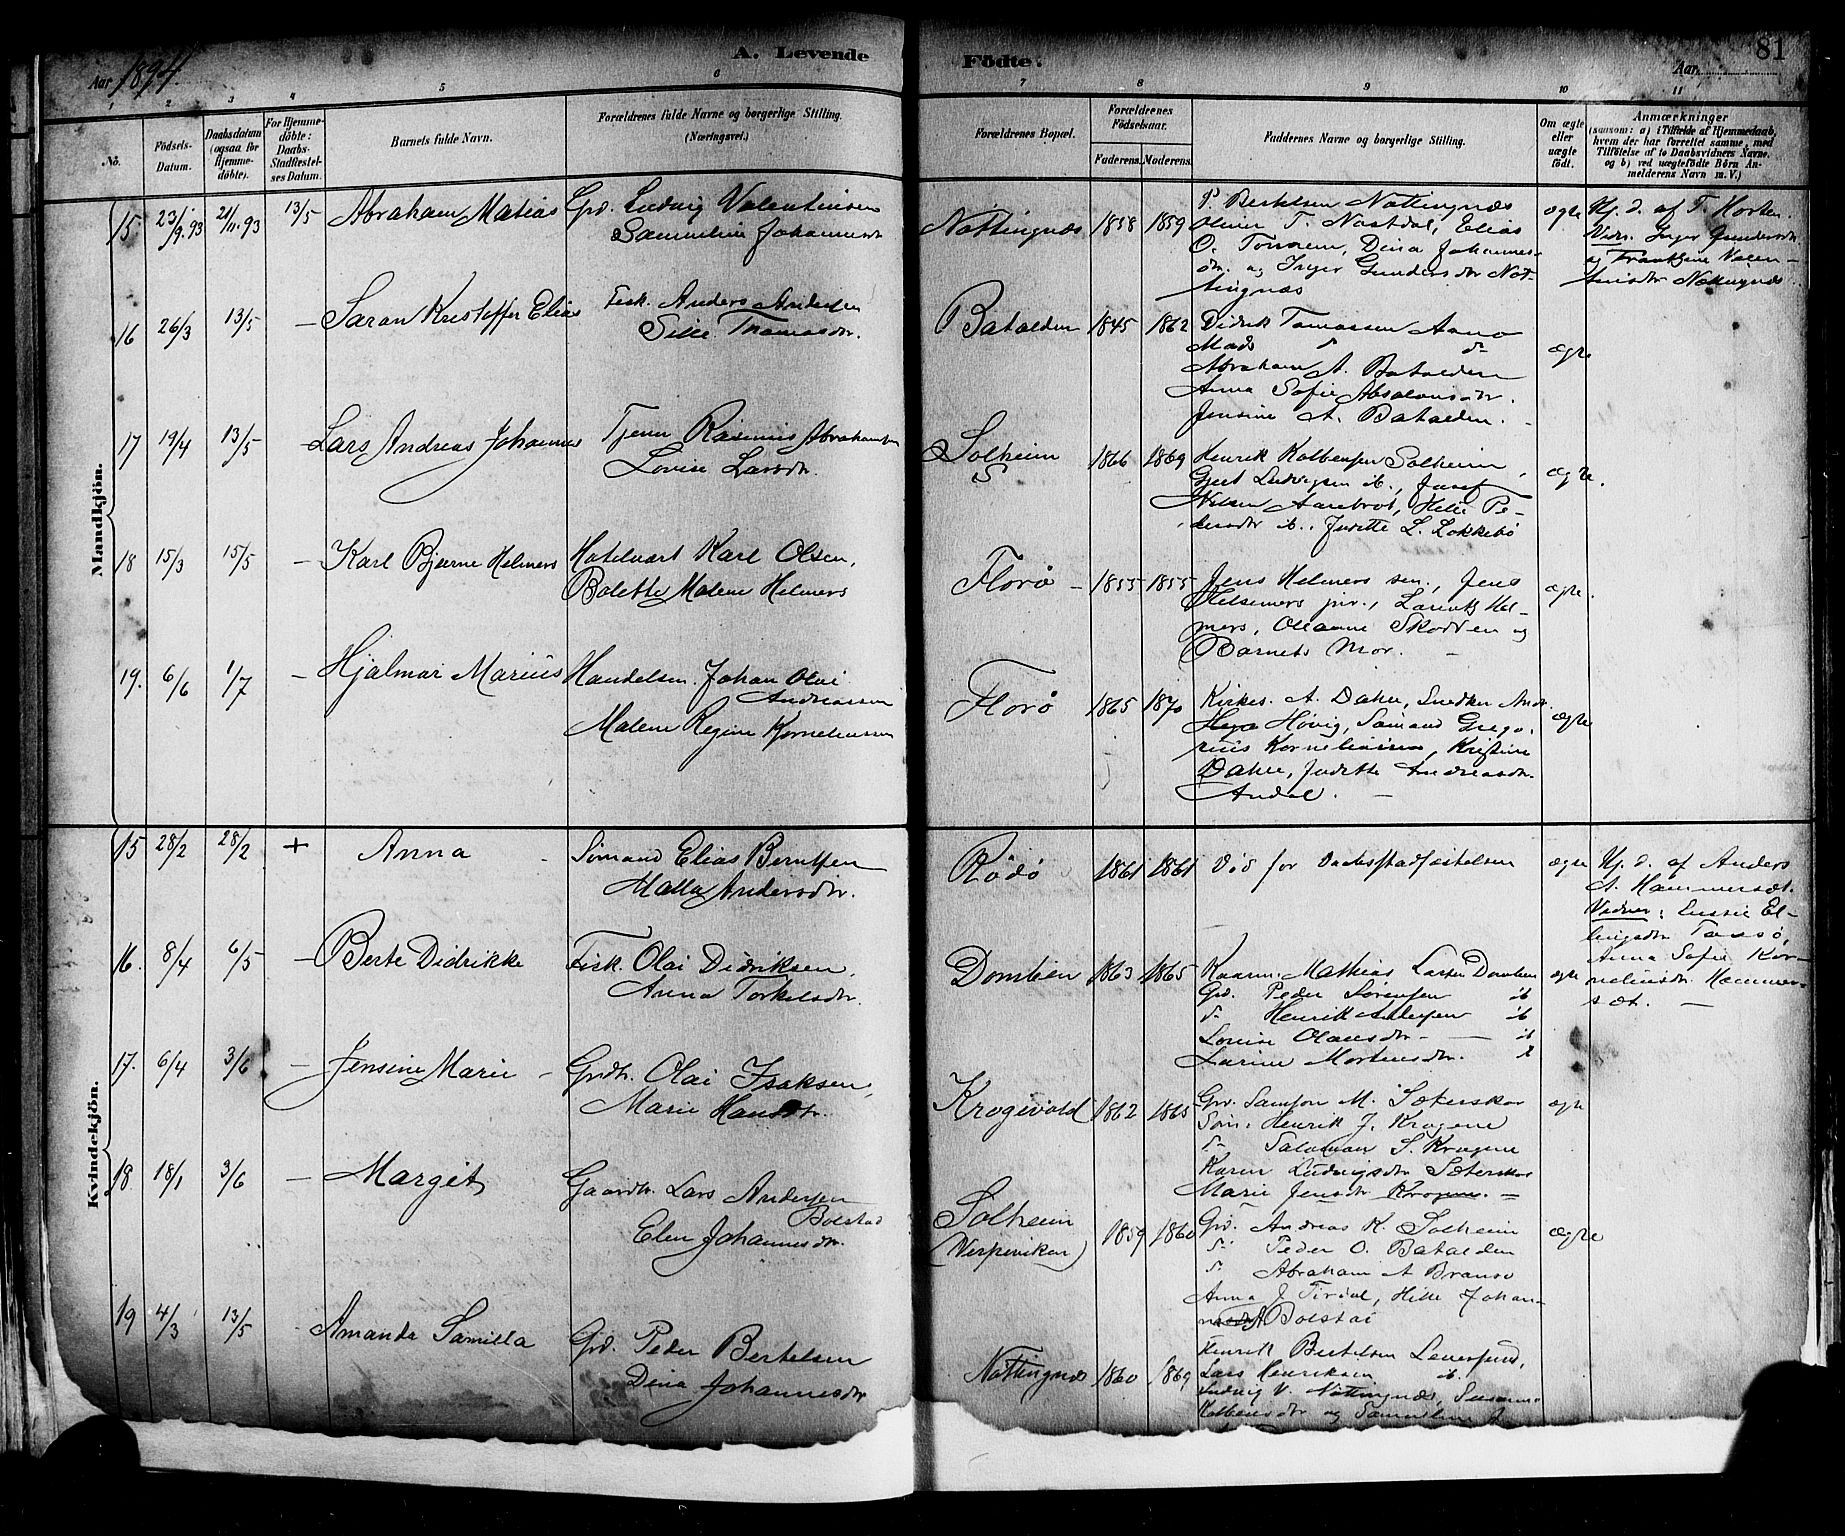 SAB, Kinn sokneprestembete, H/Hab: Parish register (copy) no. A 2, 1882-1906, p. 81